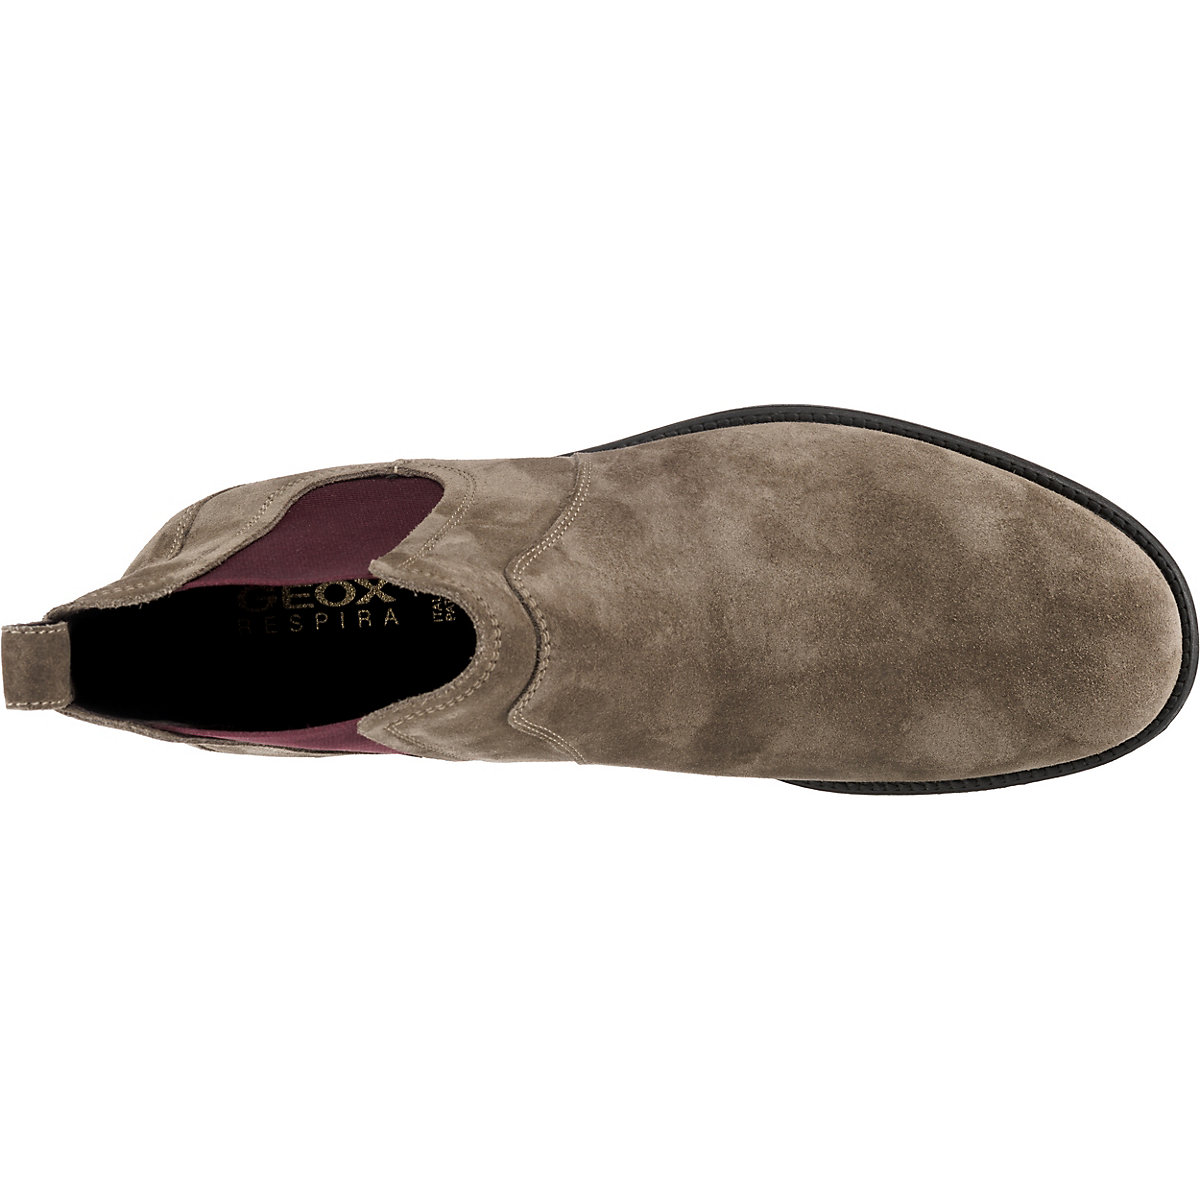 Geox, U Jaylon Chelsea Boots, Taupe